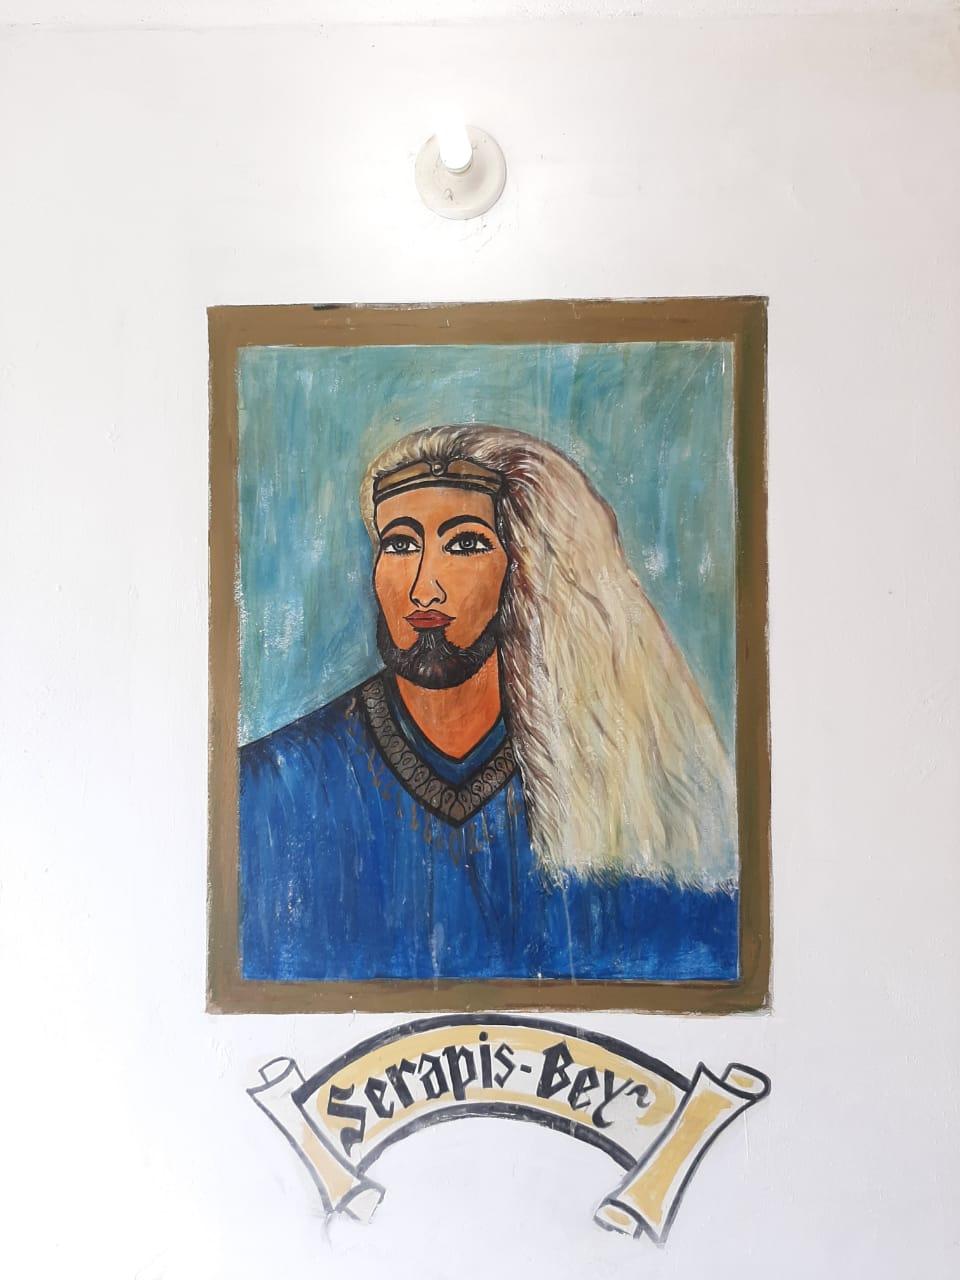 Serapis - Bey